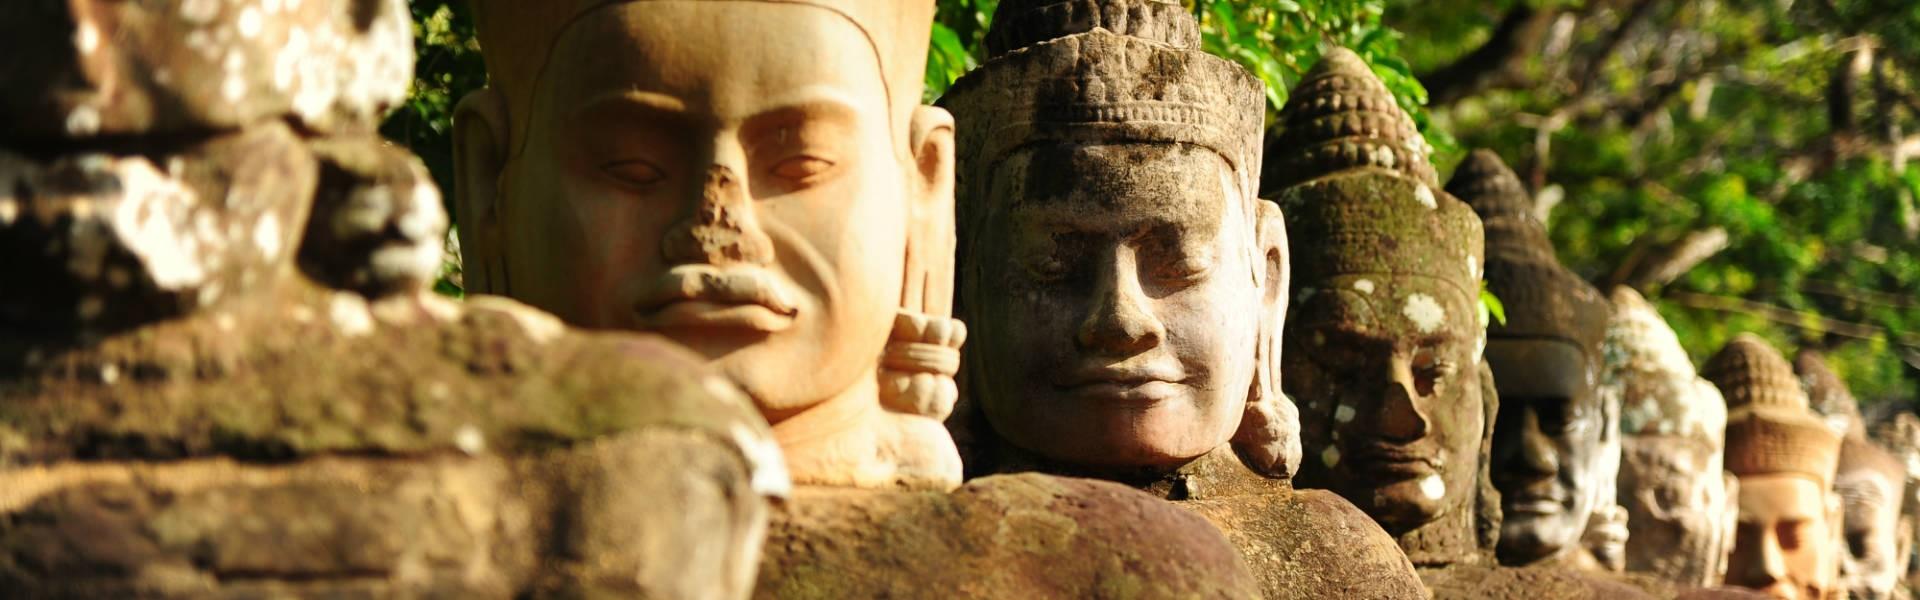 https://teamam.golftripz.com/wp-content/uploads/2017/06/Angkor-Thom-Siem-Reap-Cambodia-600-1920x600.jpg